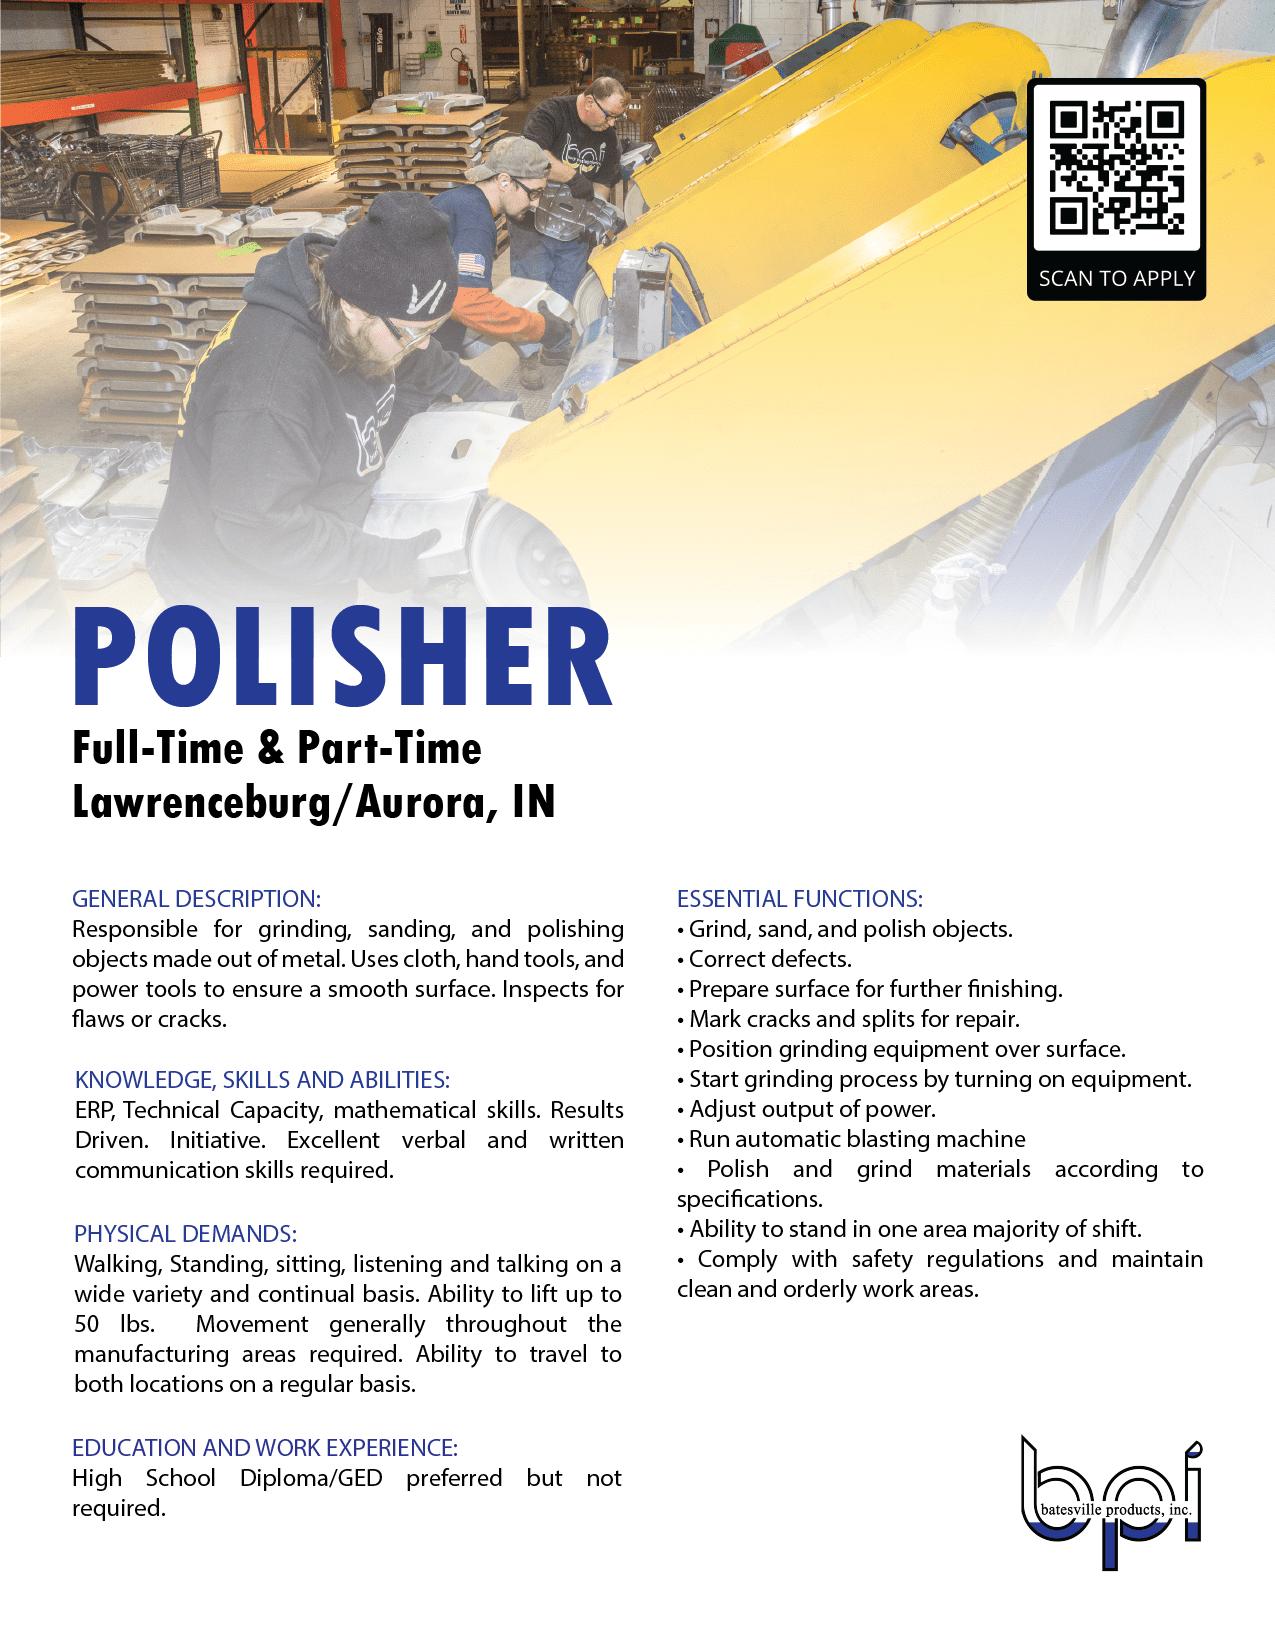 polishing job description